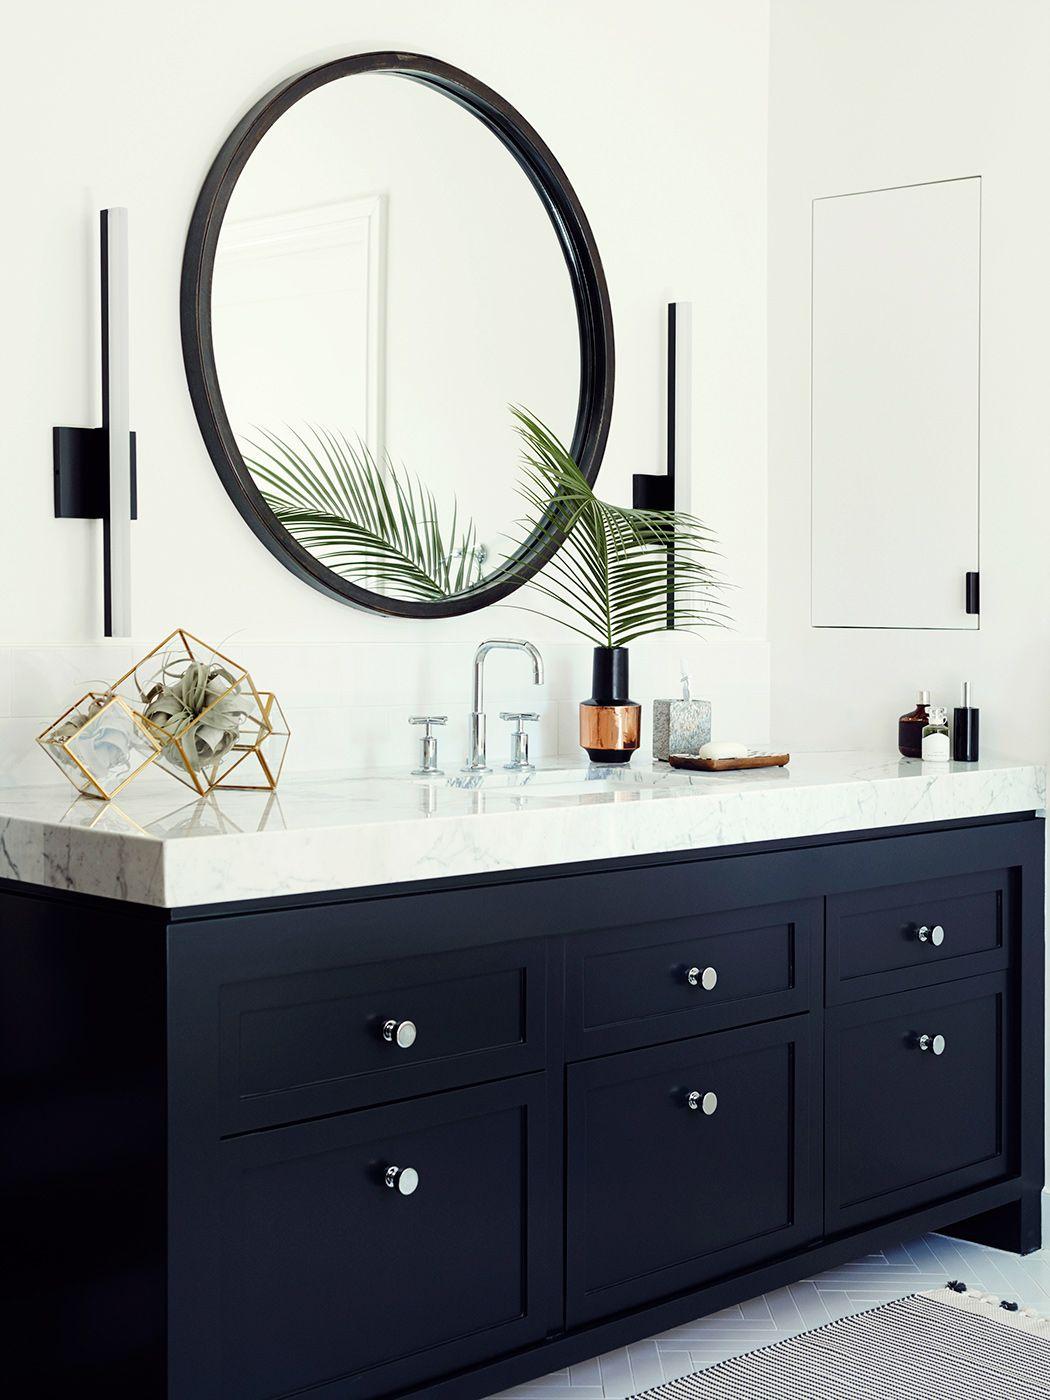 Stylish bathroom via Domaine The built in medicine cabinet ...